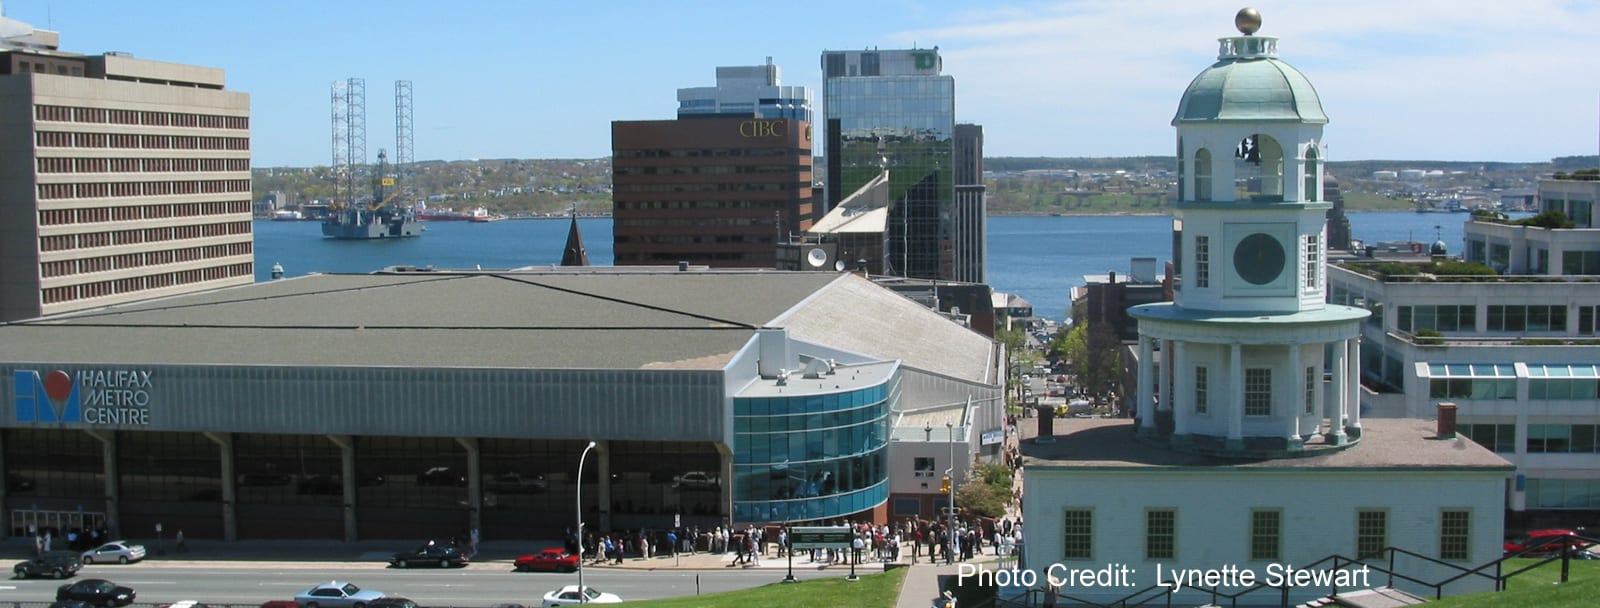 Halifax - view from Citadel Hill - sliver (Lynette Stewart)